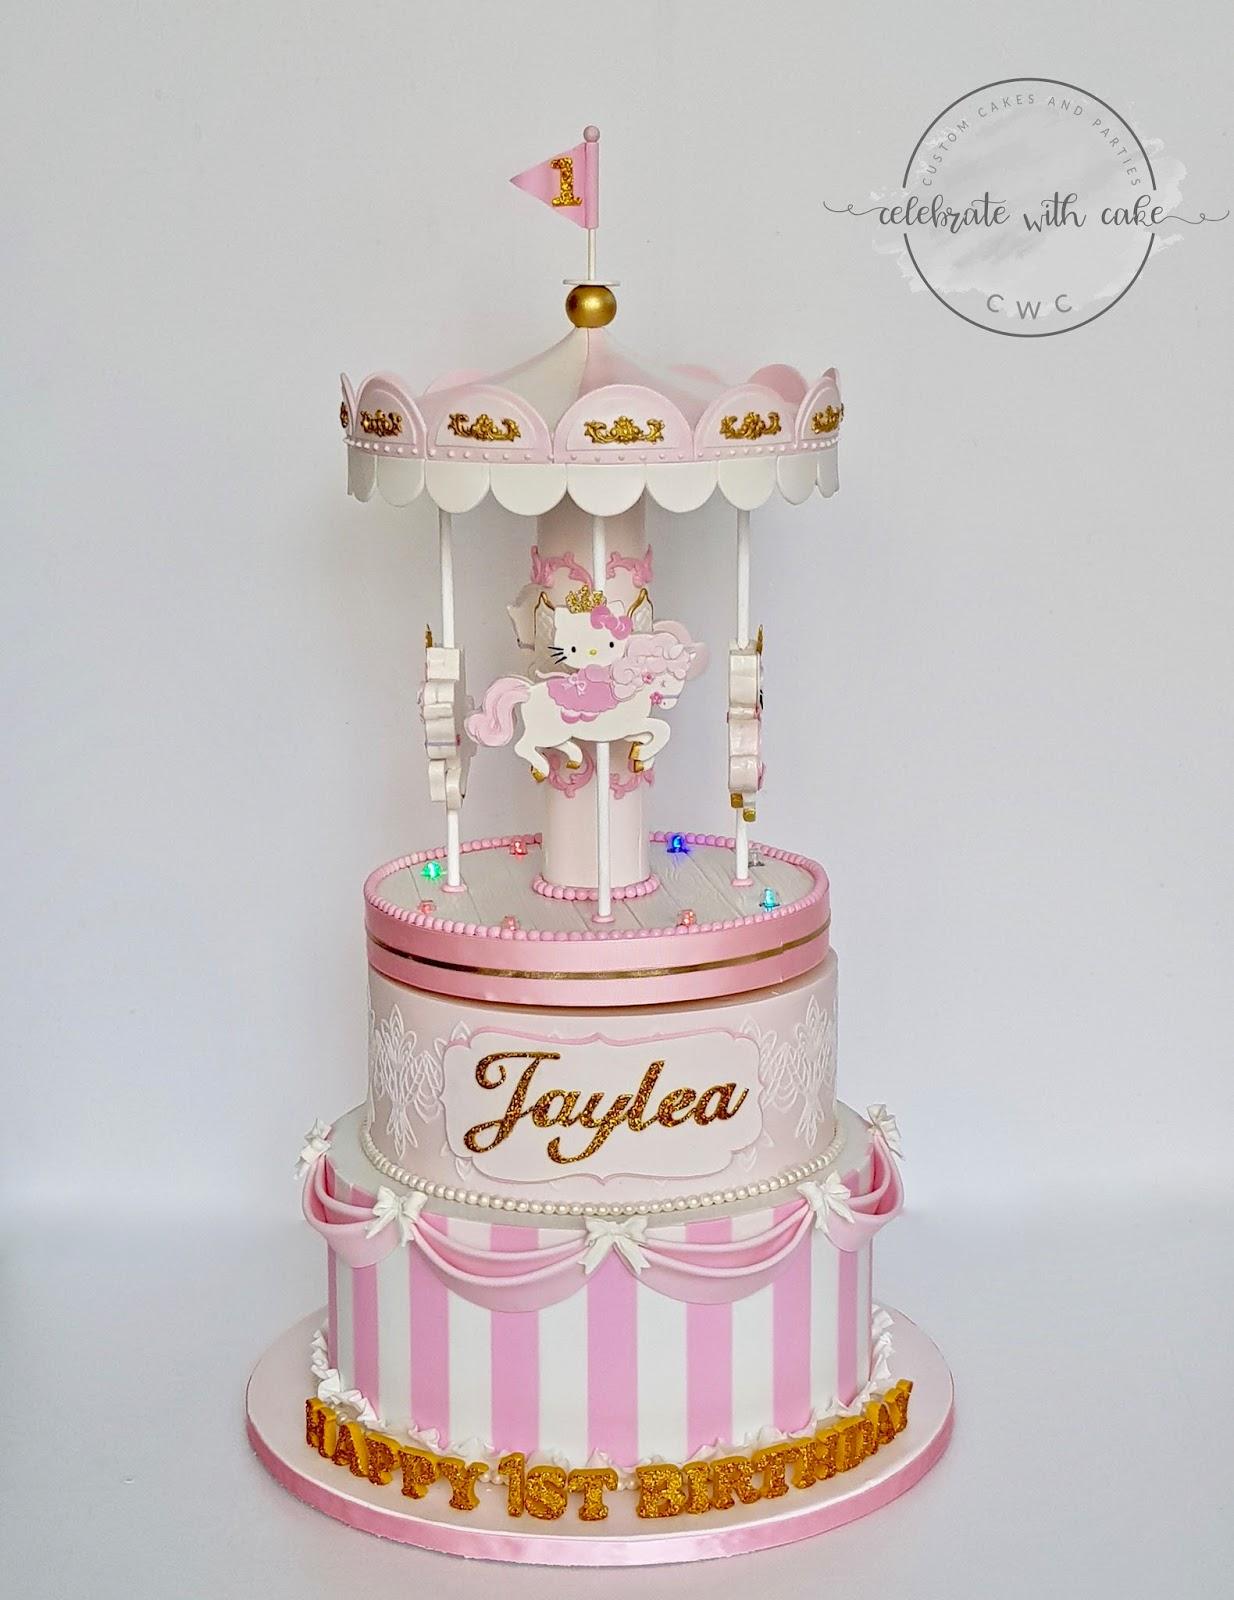 Celebrate With Cake Hello Kitty Rotating Carousel 1st Birthday